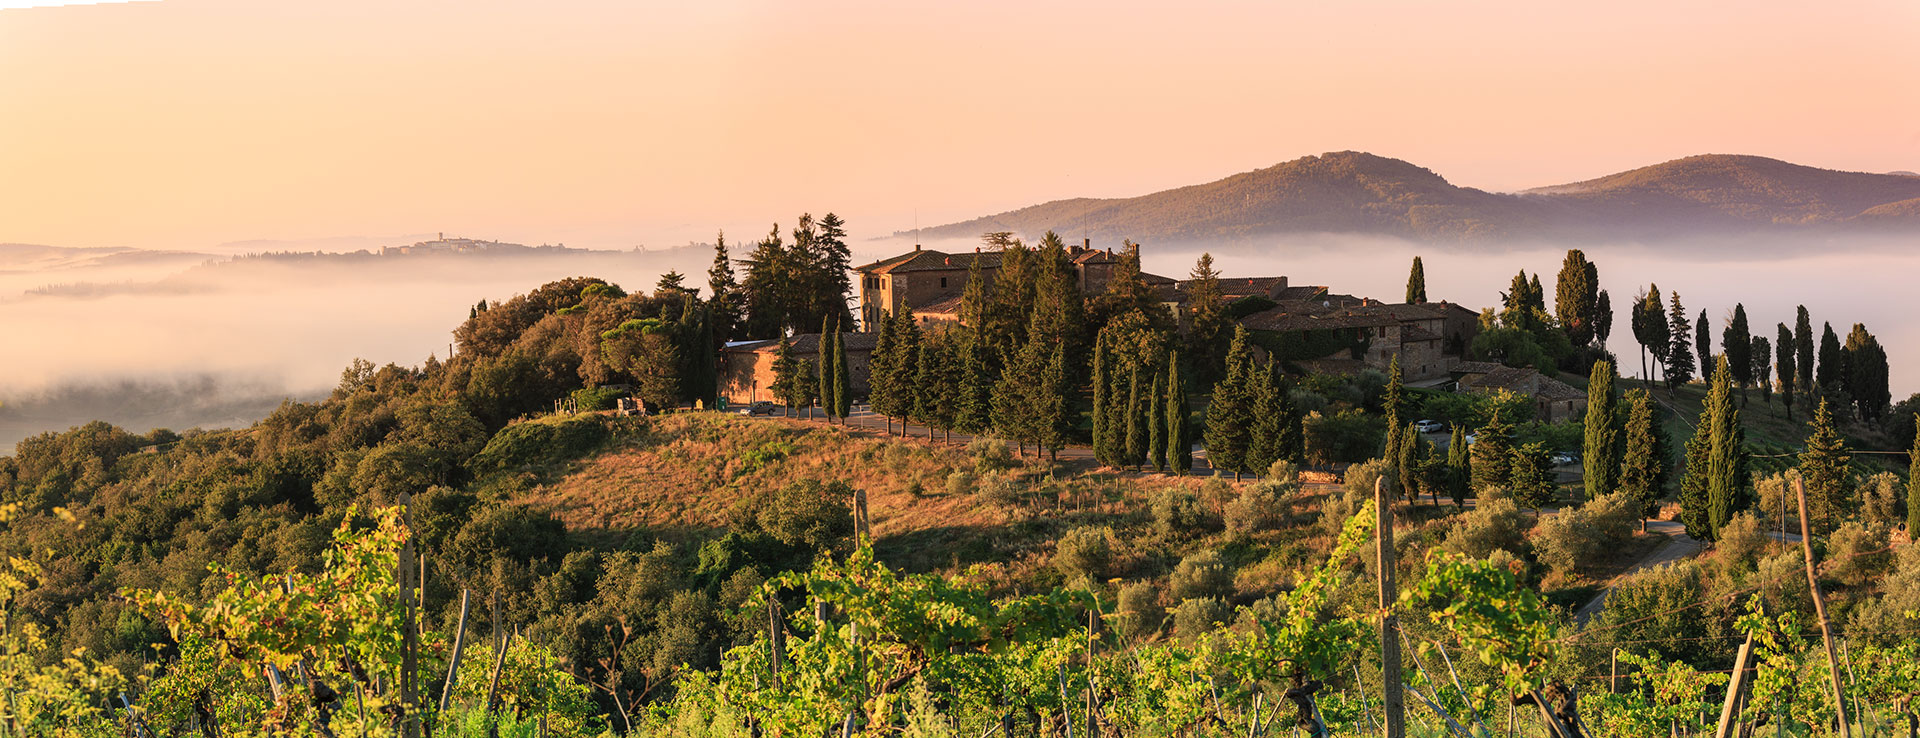 Castelvecchi_hills+cellar.jpg